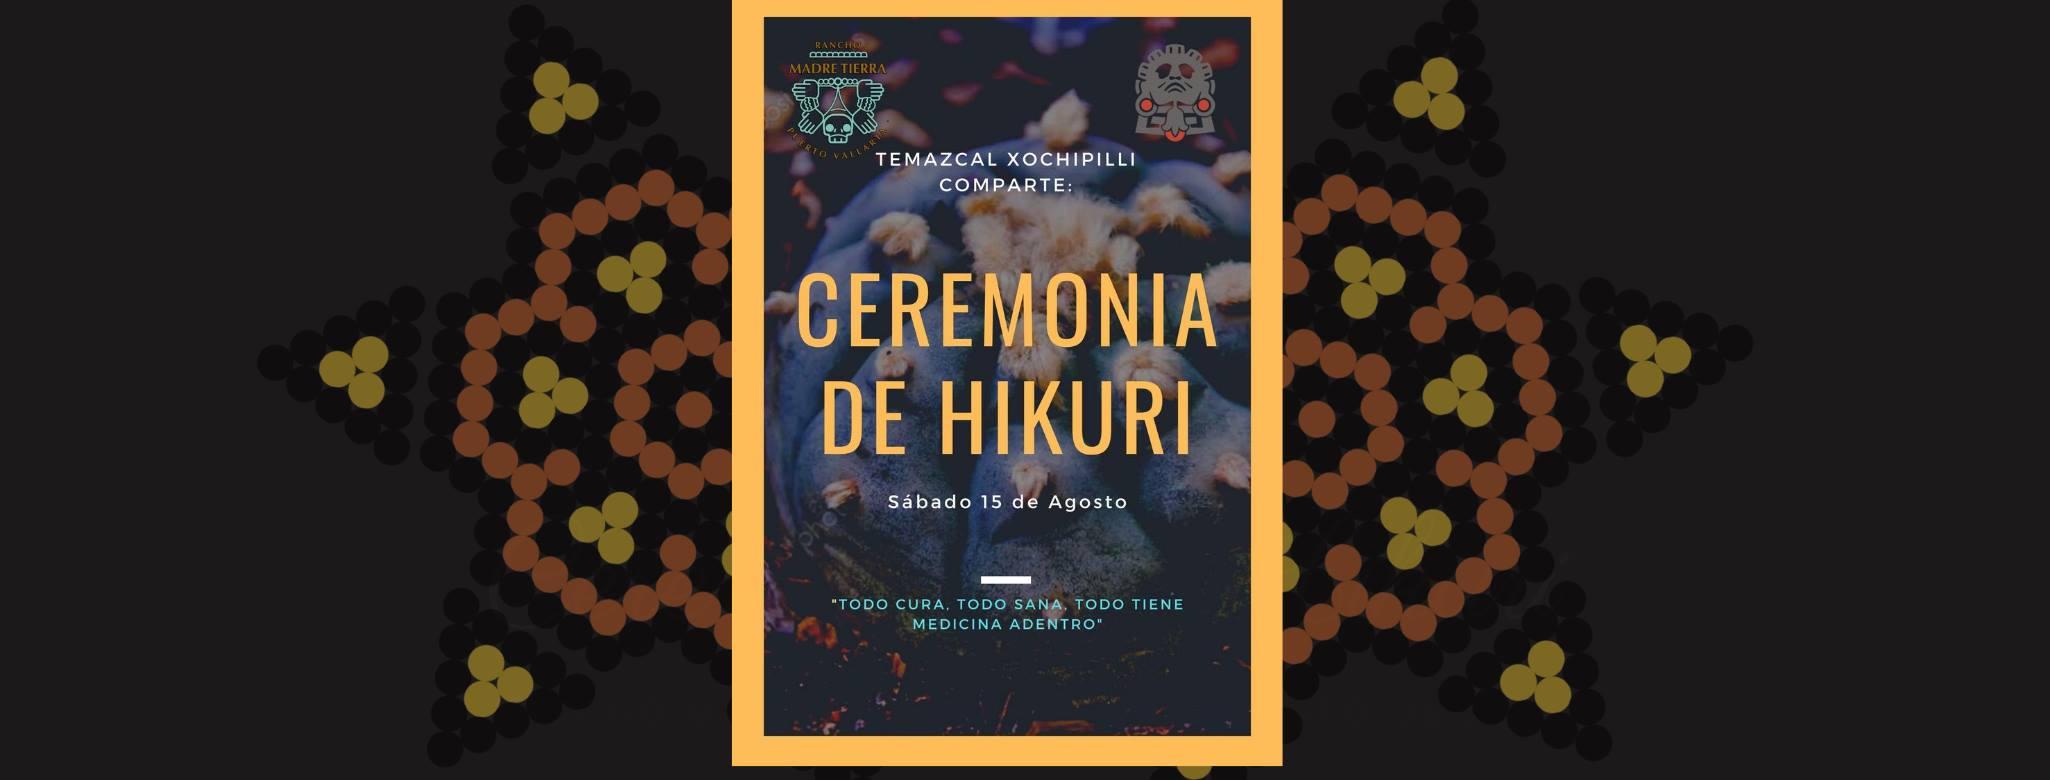 Ceremonia de Hikuri